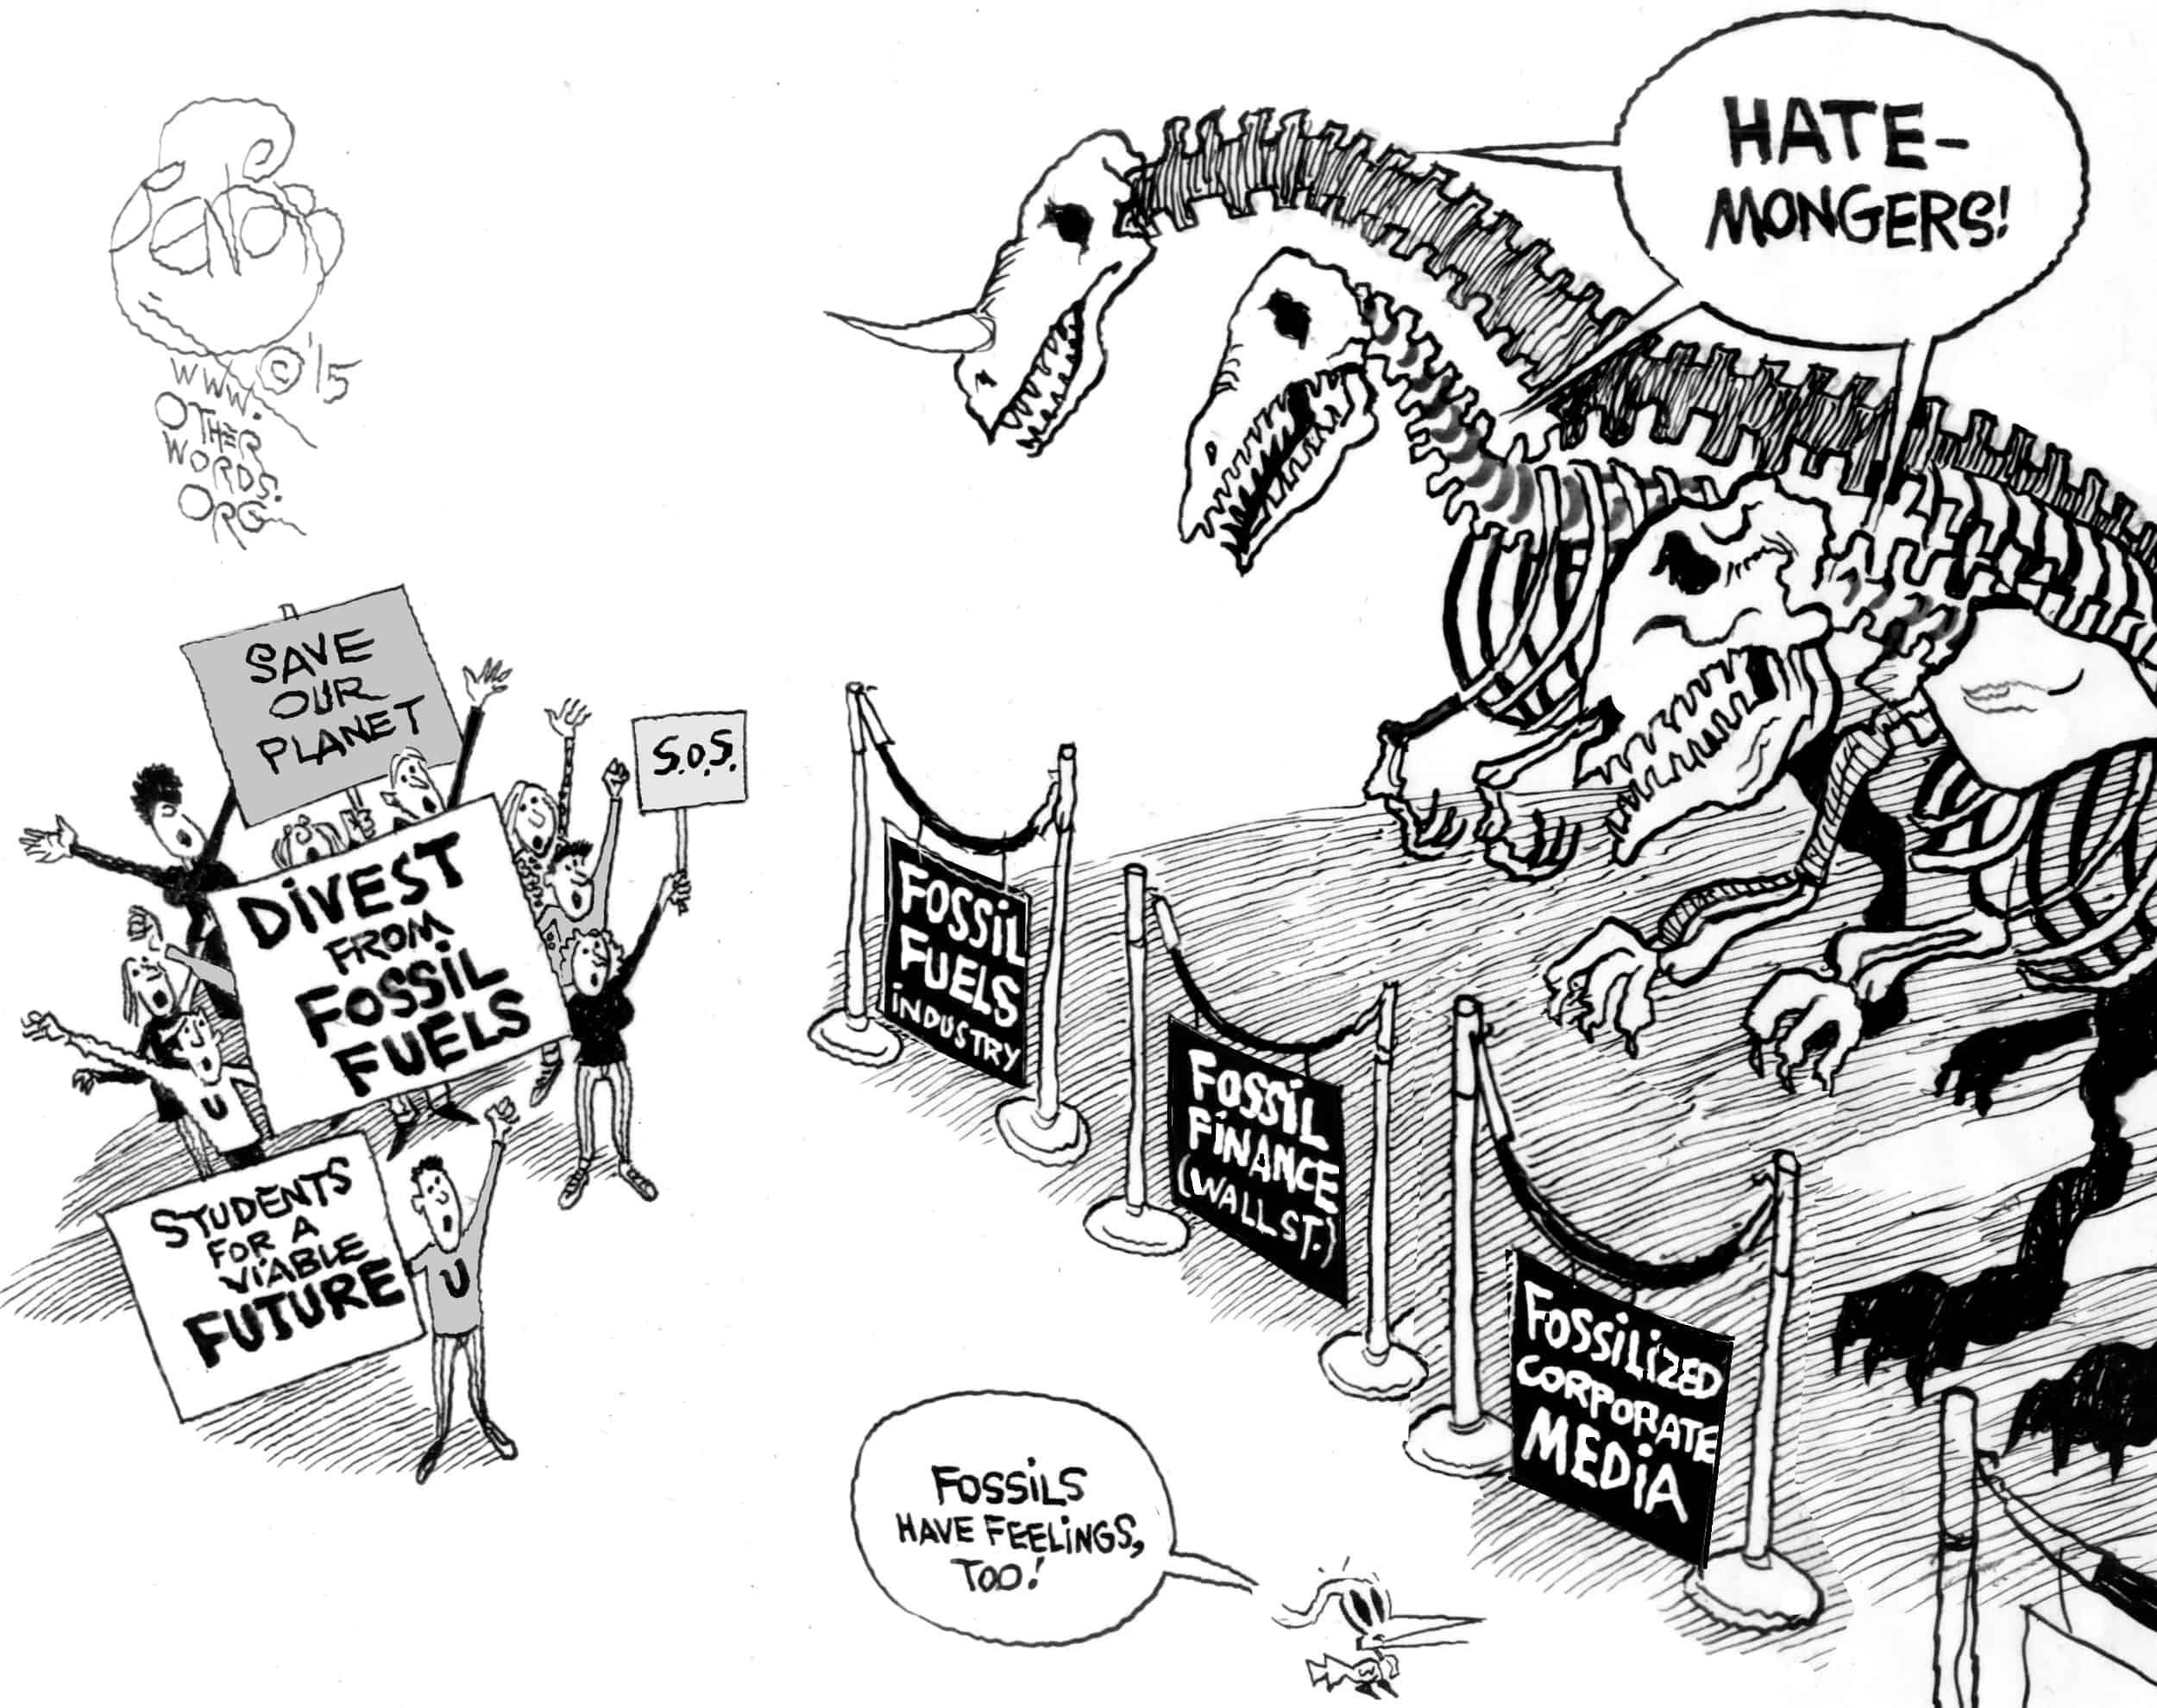 Fossil Fuel Extinction by Khalil Bendib @ OtherWords.